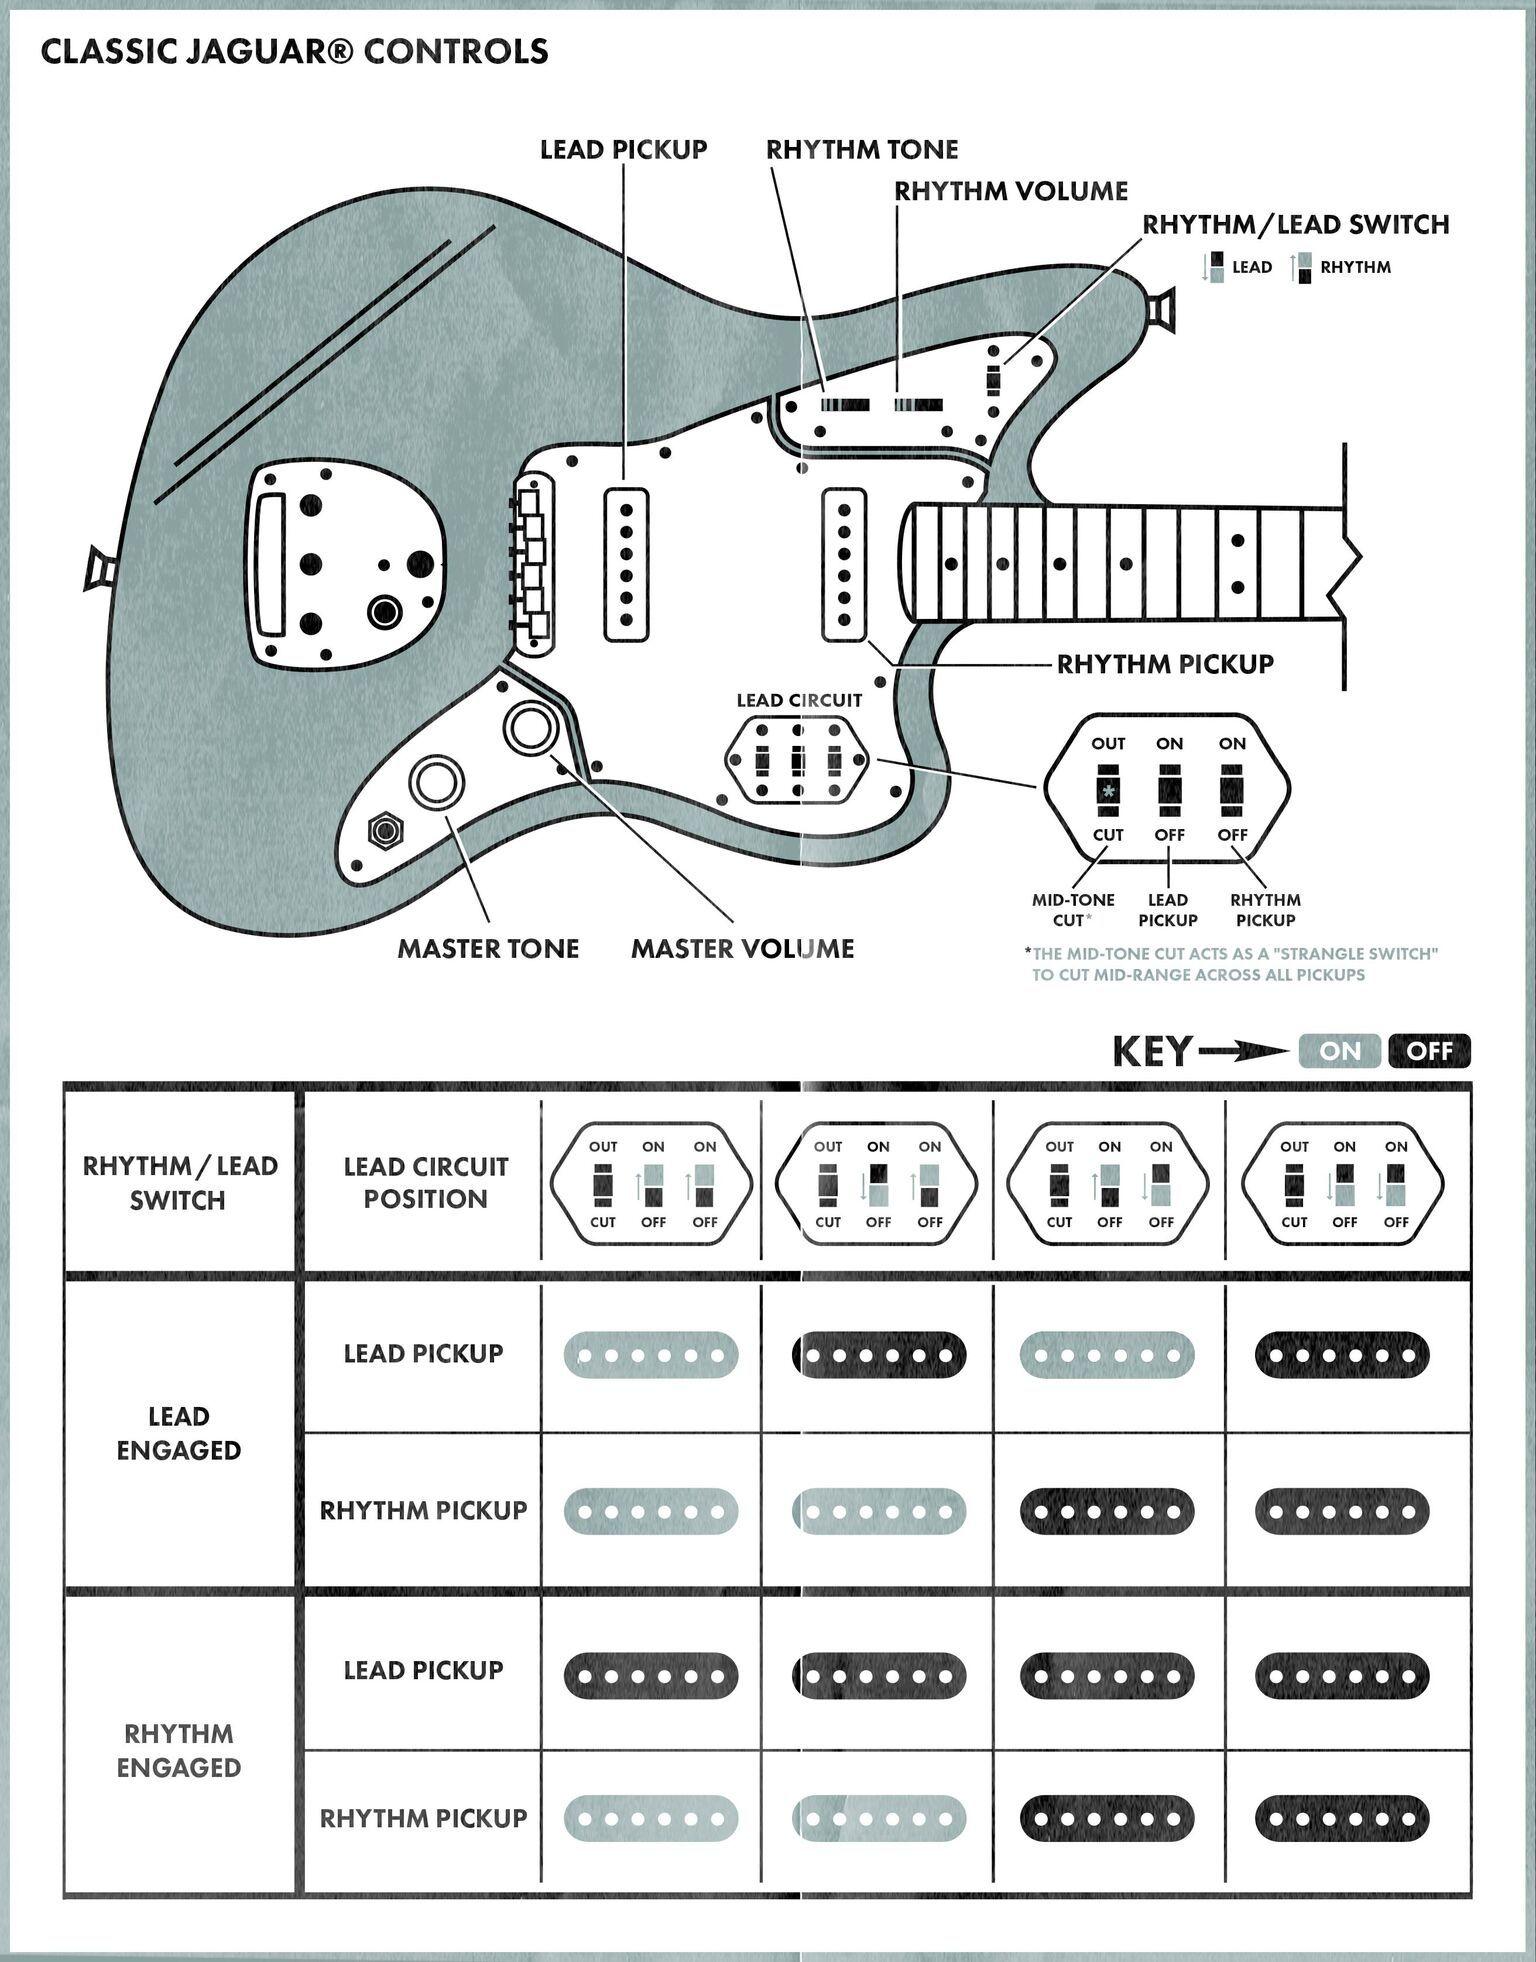 Classic Jaguar Controls Fender Jaguar Guitar Pickups Luthier Guitar